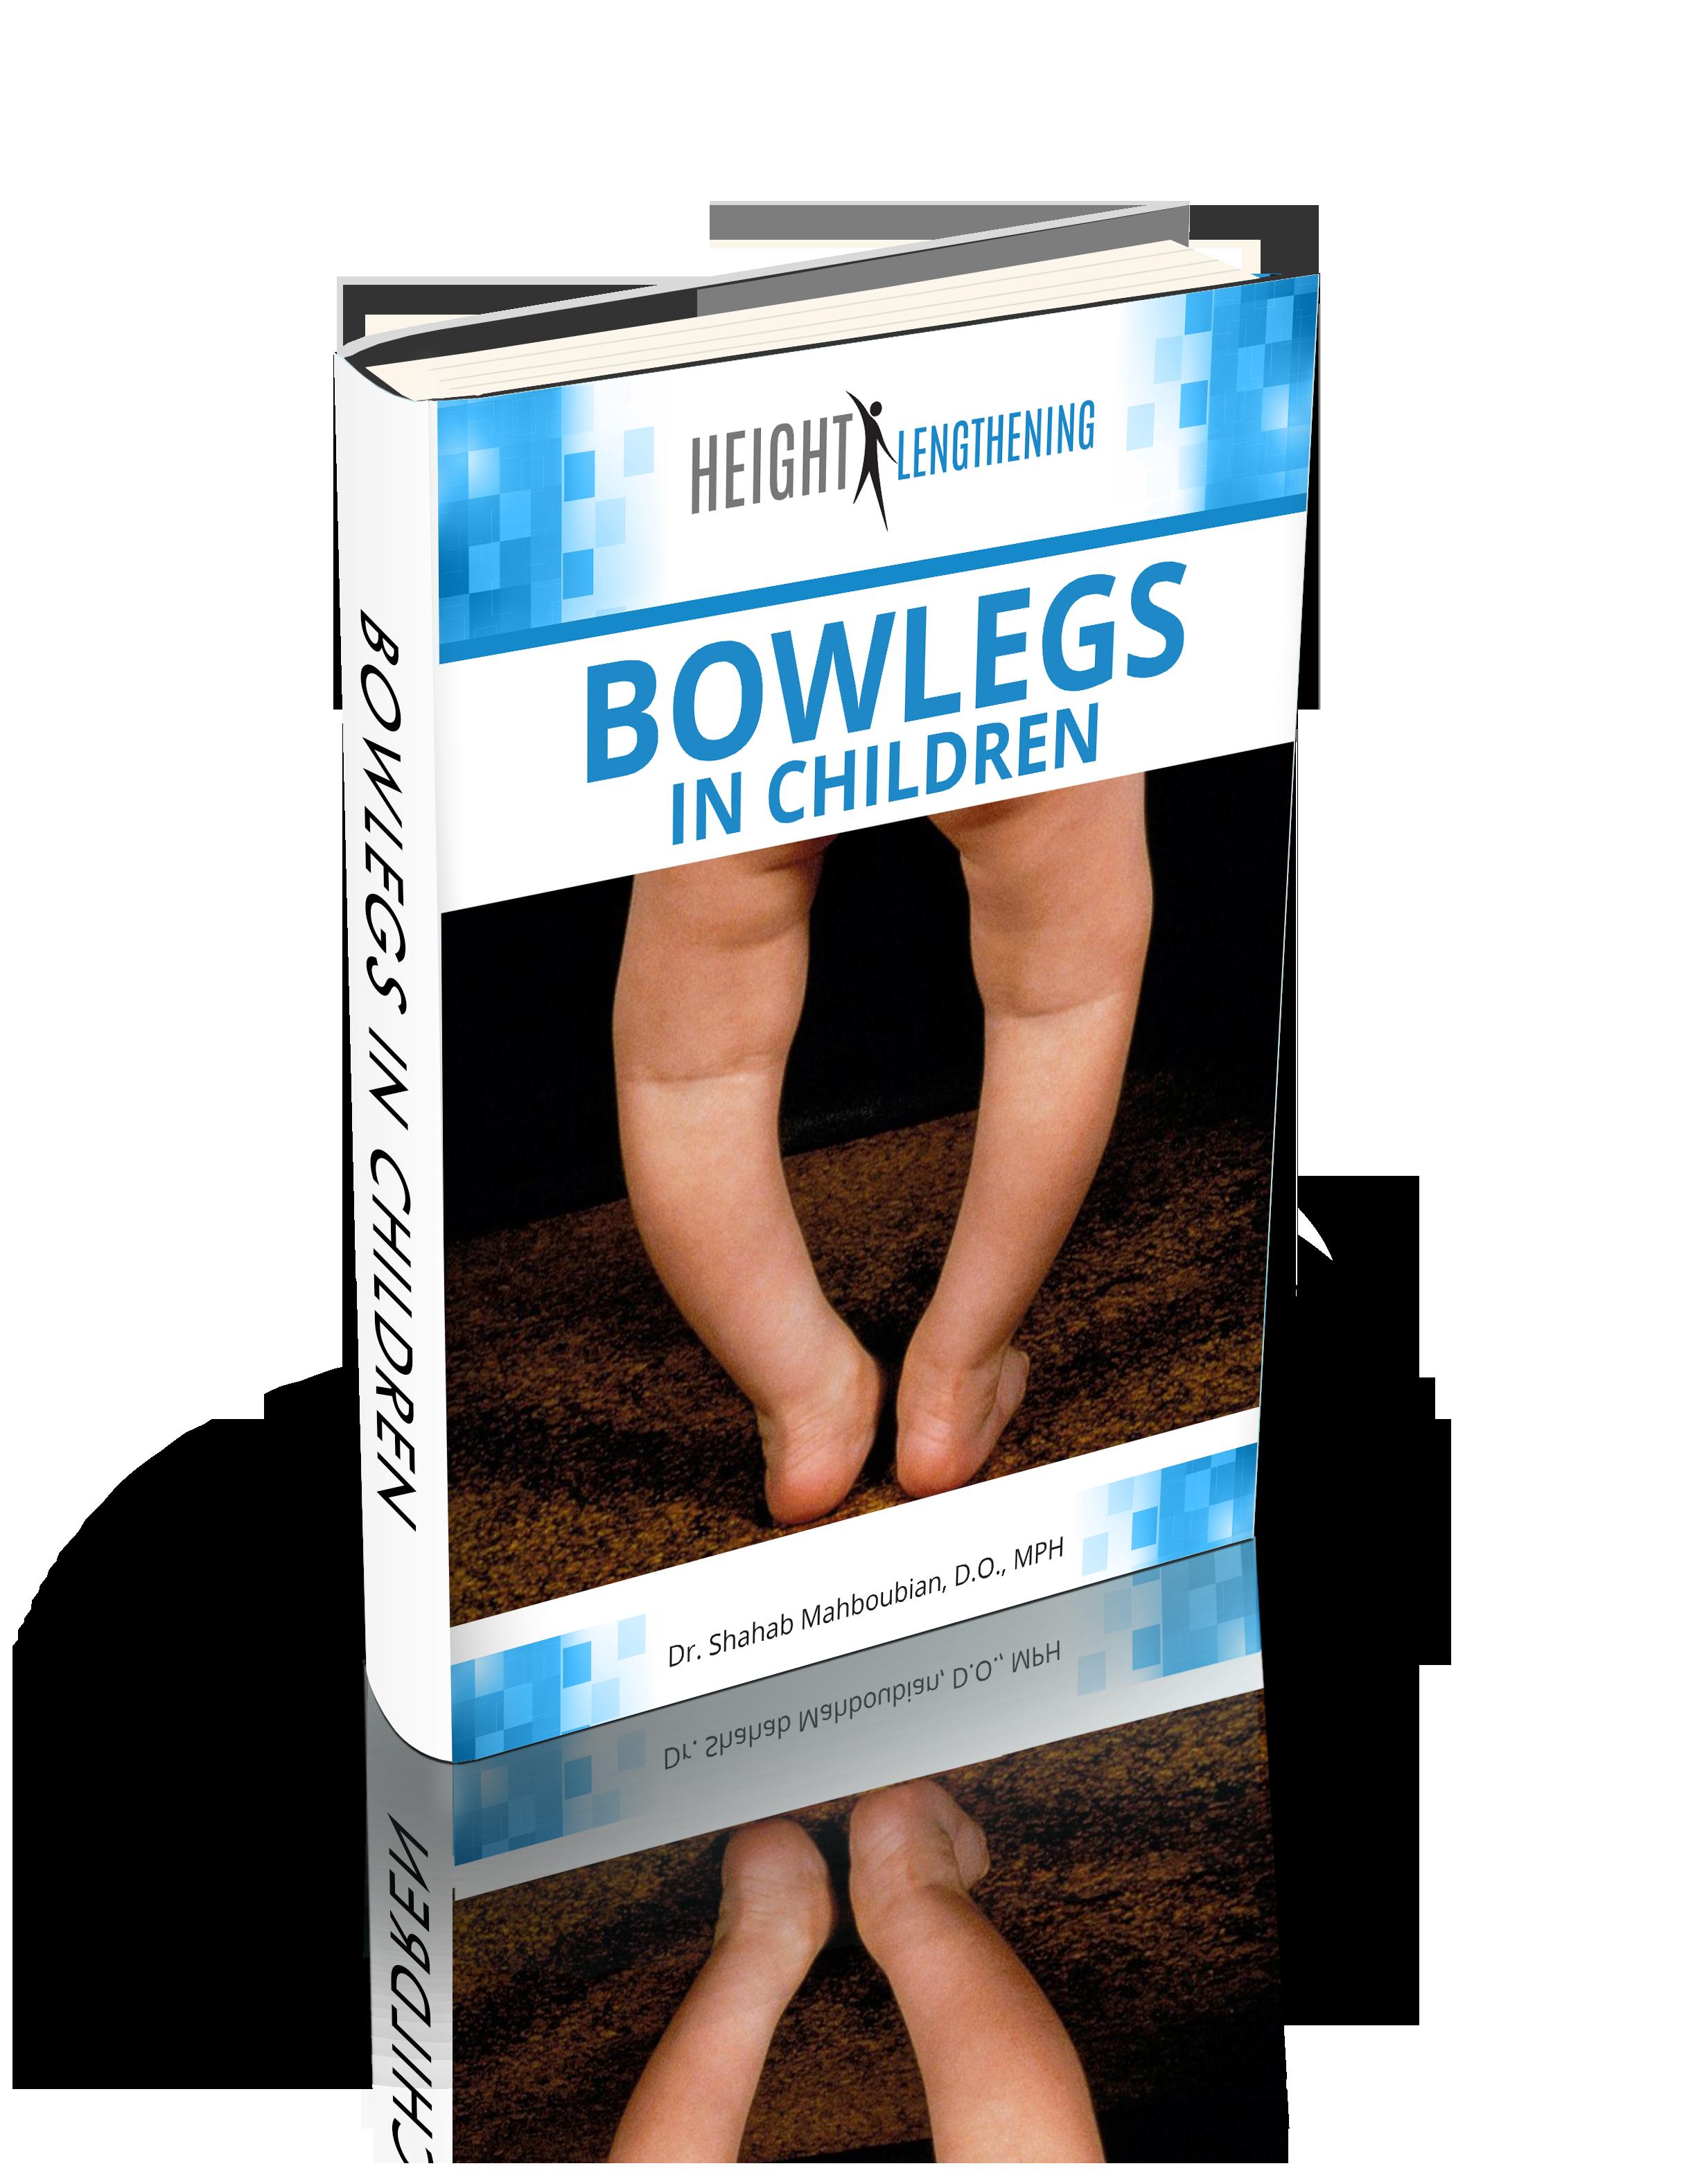 Bowlegs in Children FREE eBook Download